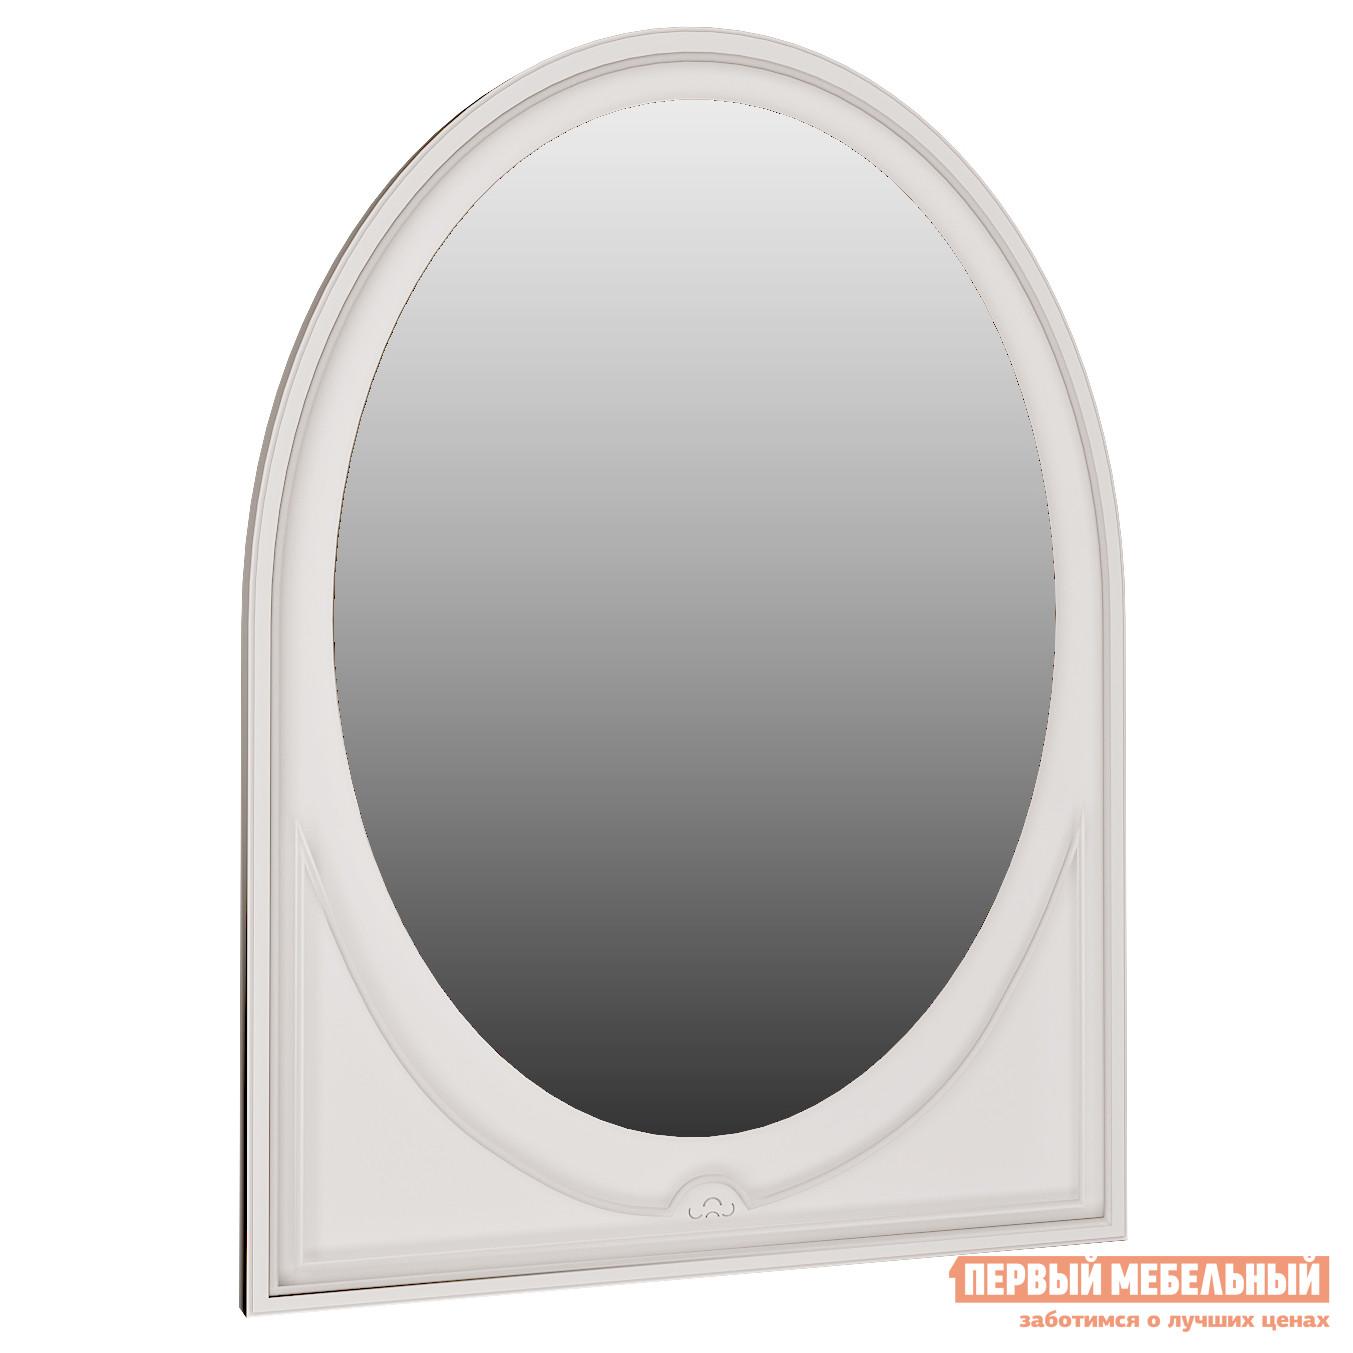 Настенное зеркало ТД Арника Зеркало настенное Мелания 7 зеркало интерьерное дом корлеоне зеркало настенное зебра 50 х 65 см